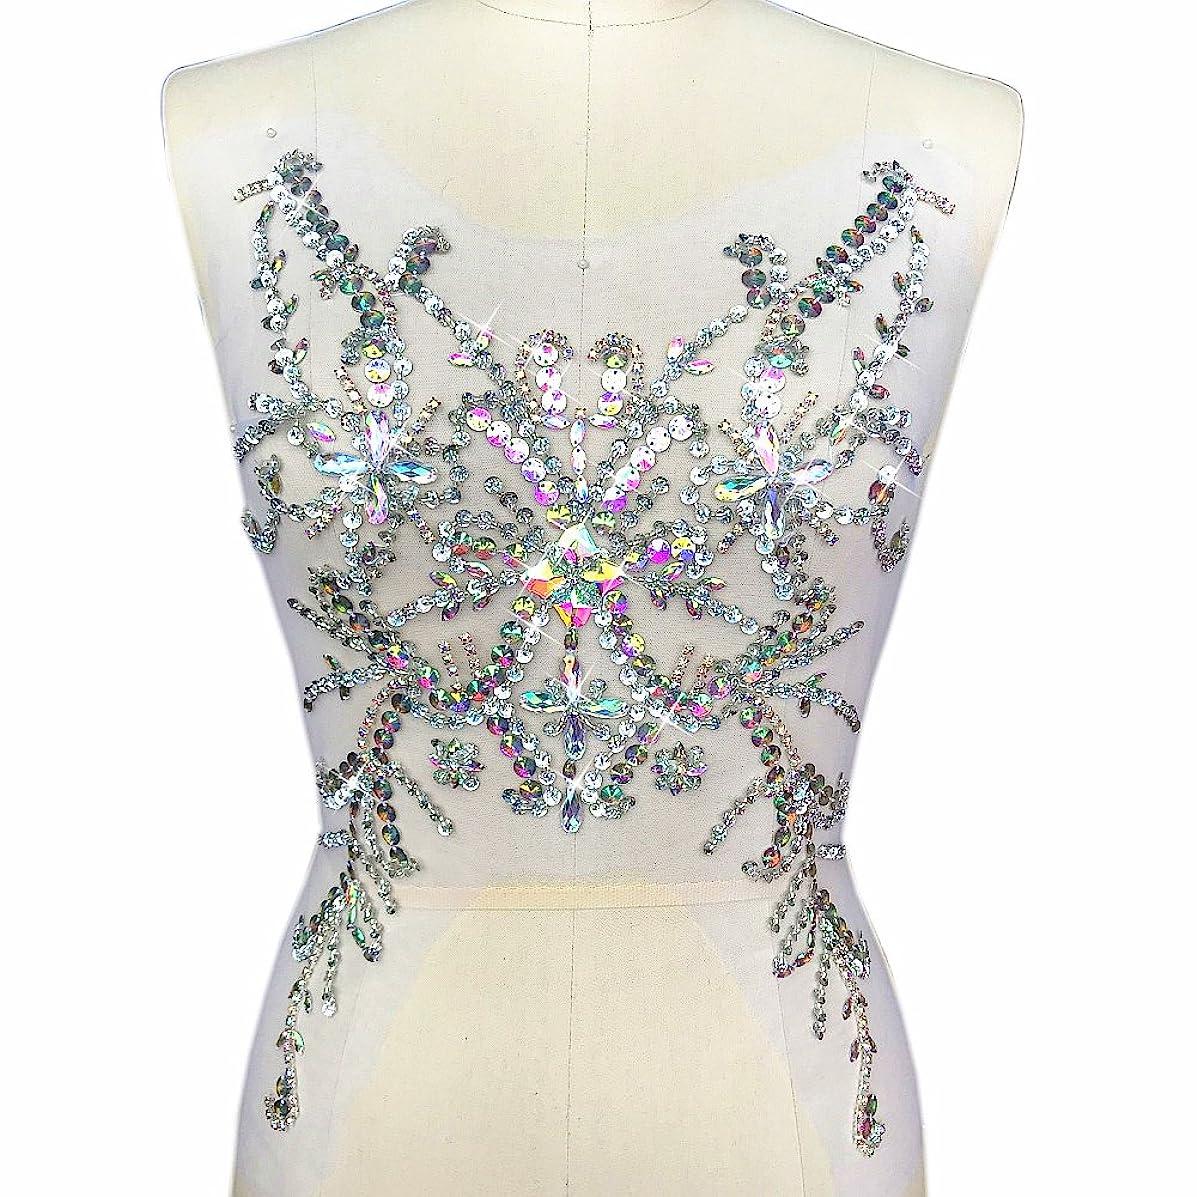 Exquisite Embroidery Beaded Sequin Sew on Rhinestones Applique Manual Collar Waist Costume Fine Motif Wedding Dress Trimming 28x49cm